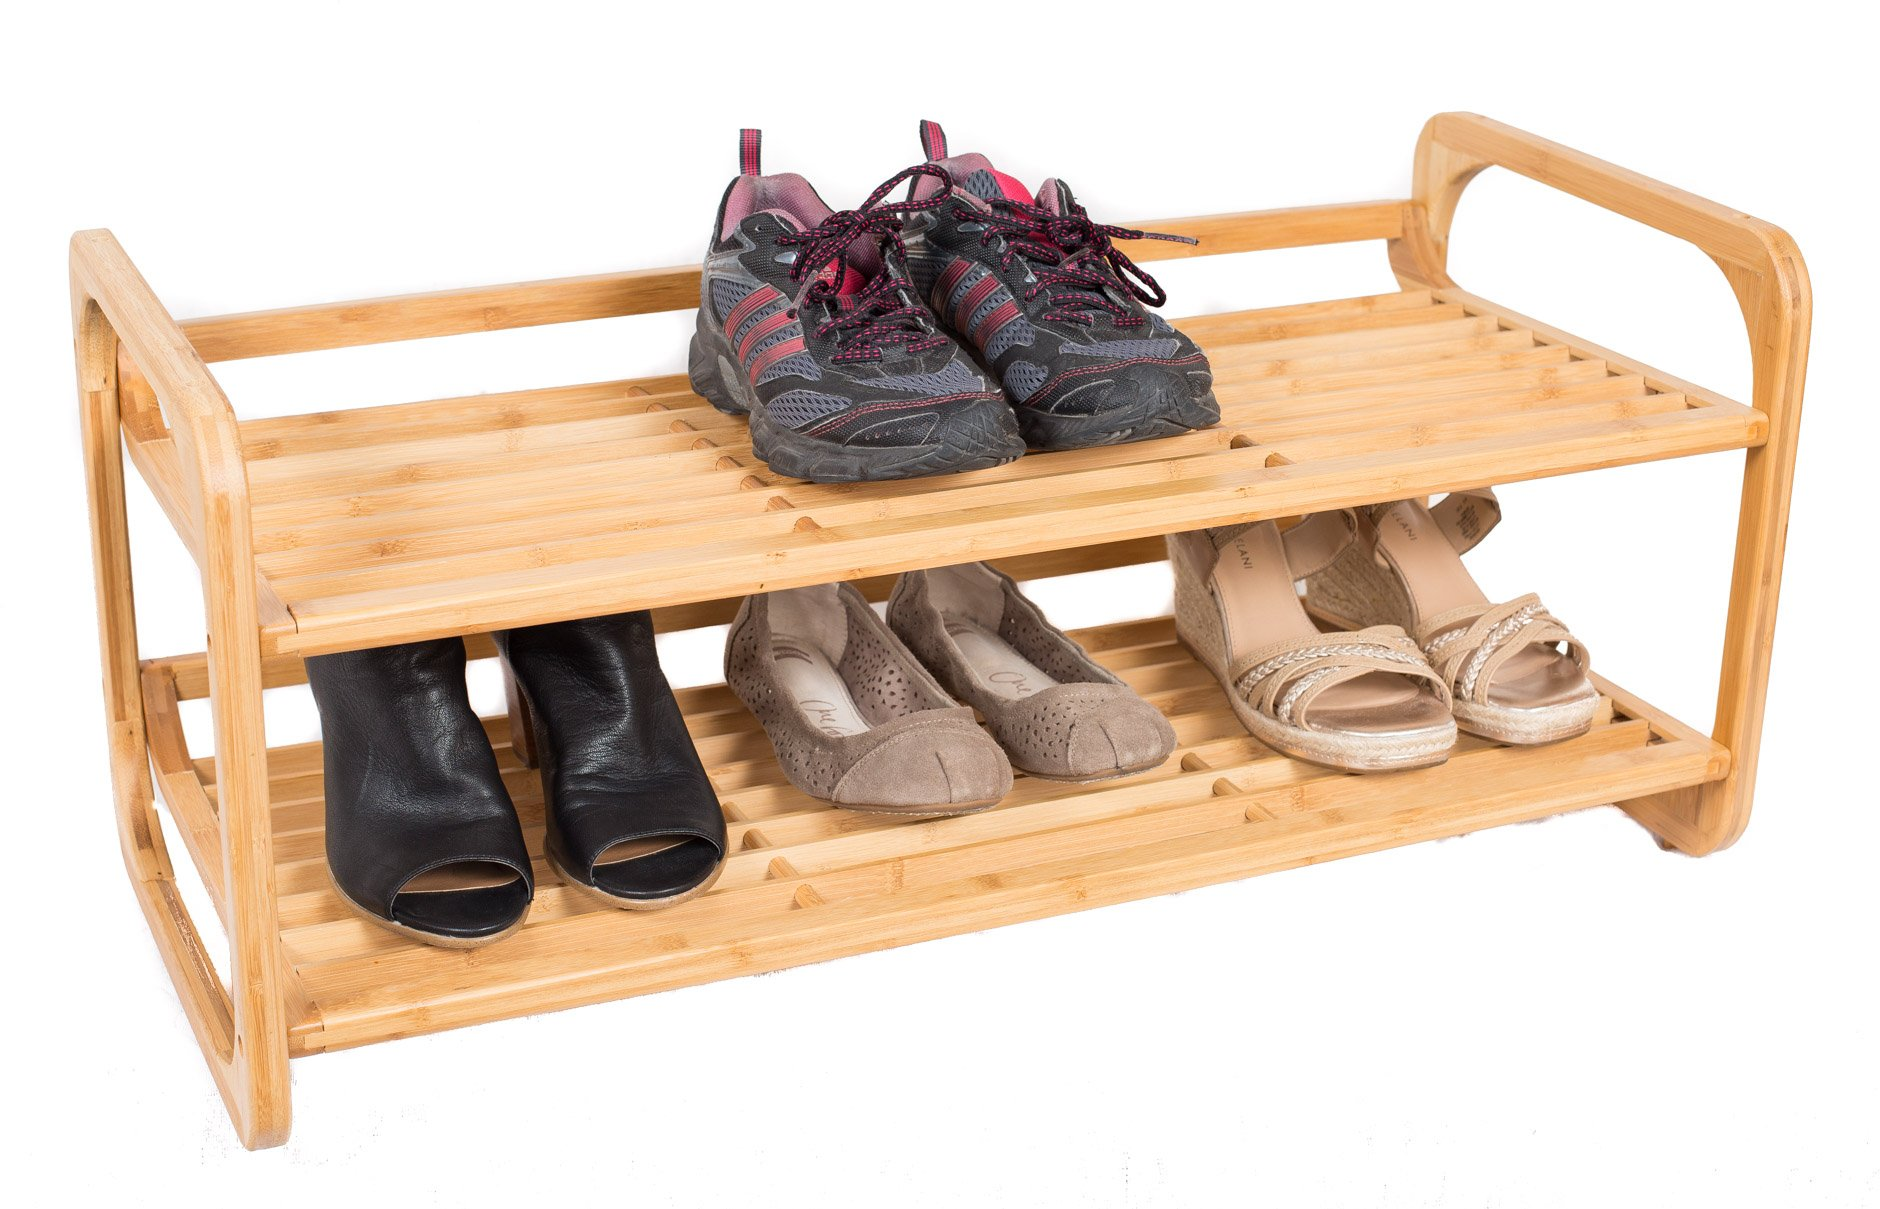 BirdRock Home 2-Tier Bamboo Shoe Rack | Environmentally Friendly | Fits 6-8 Shoes